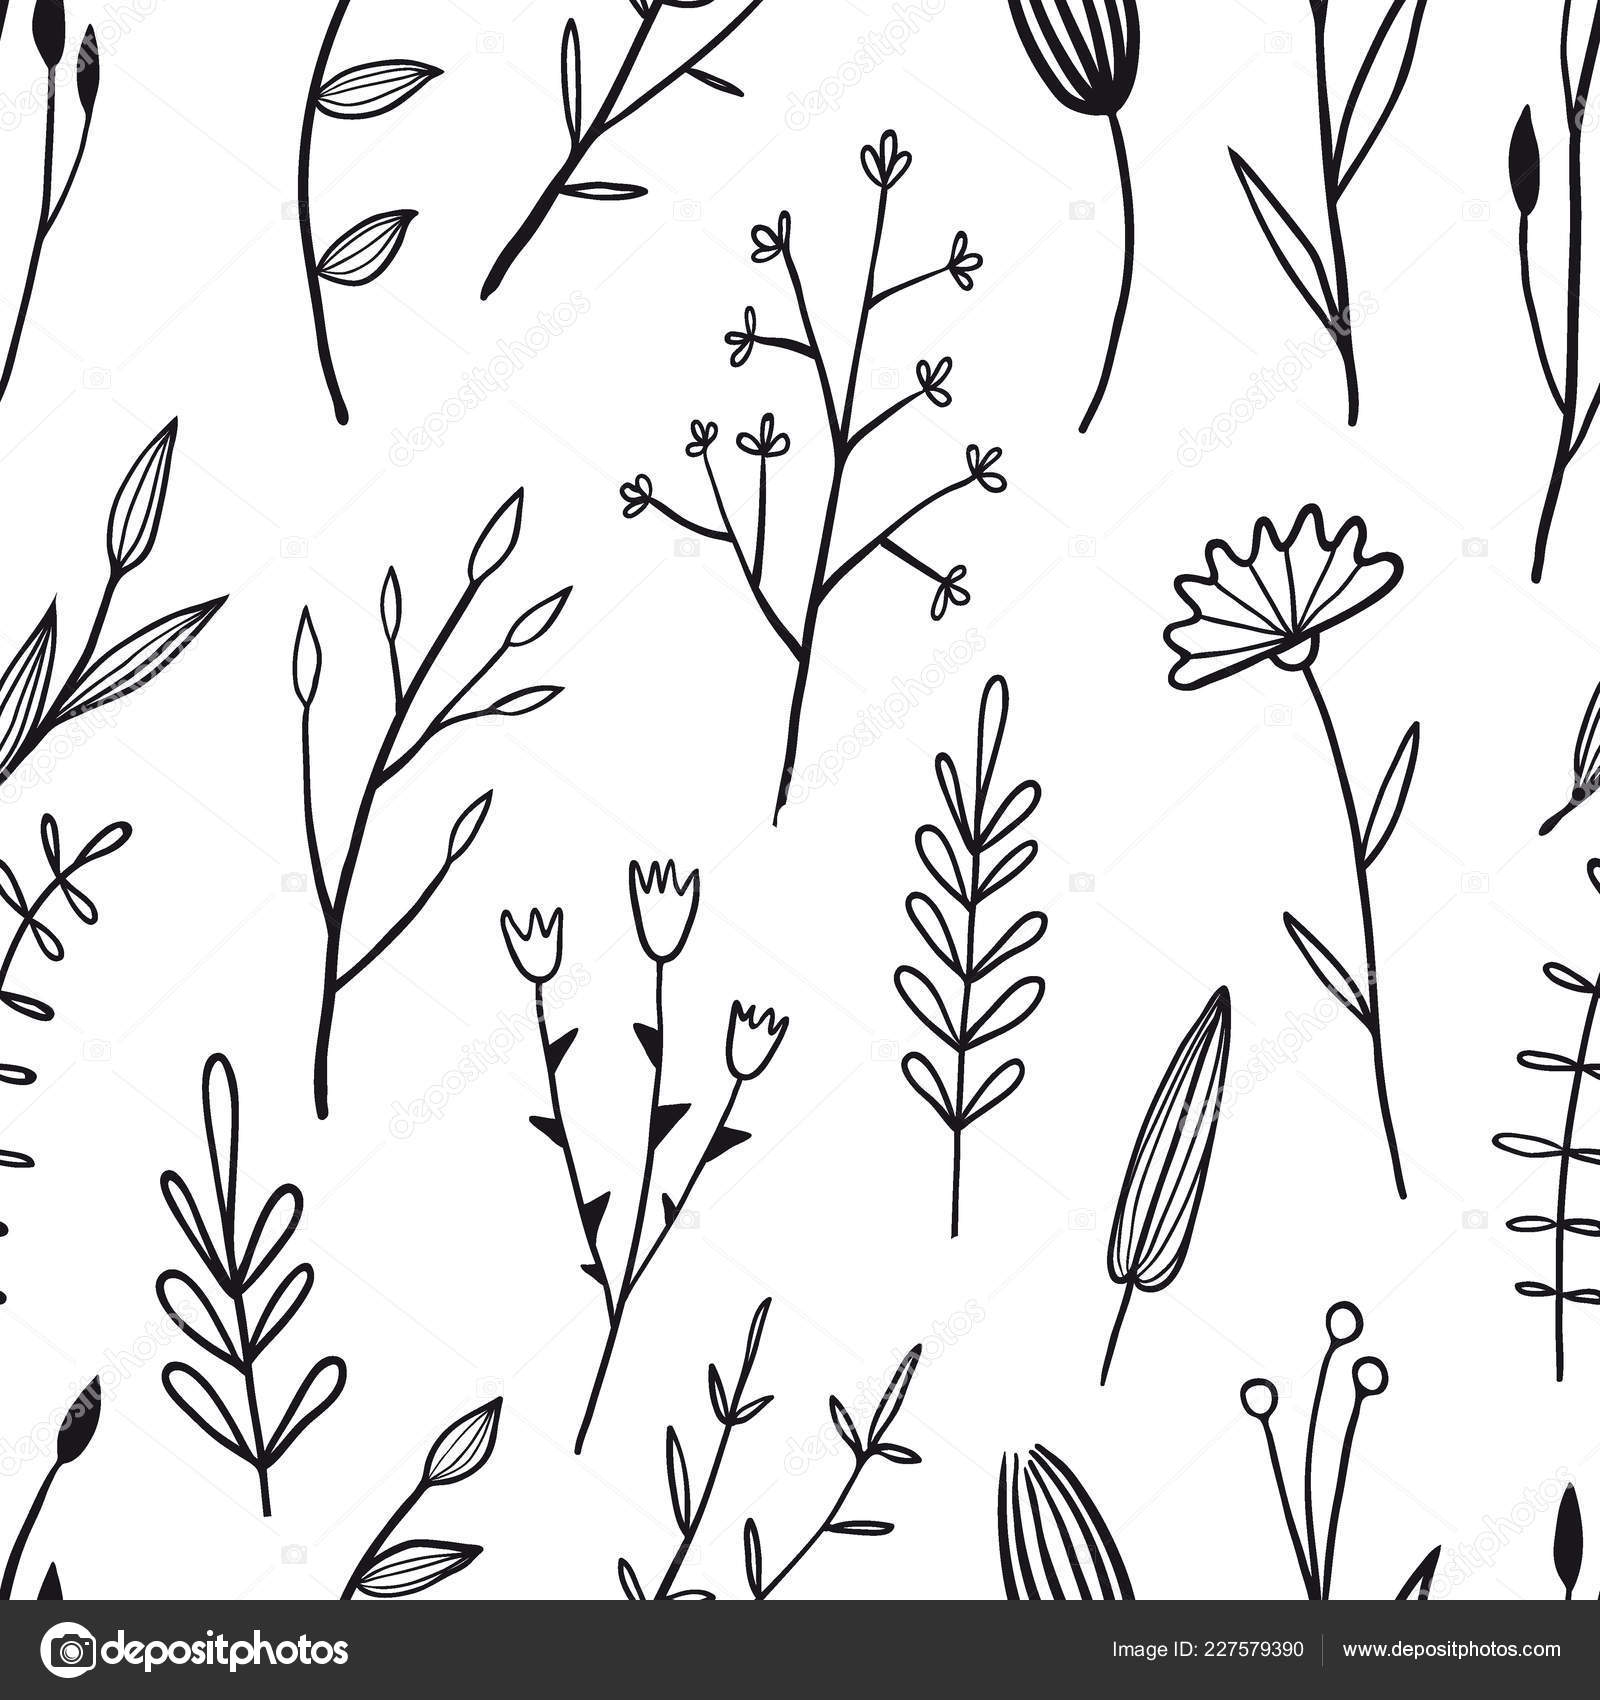 Flower simple seamless pattern \u2014 Stock Vector